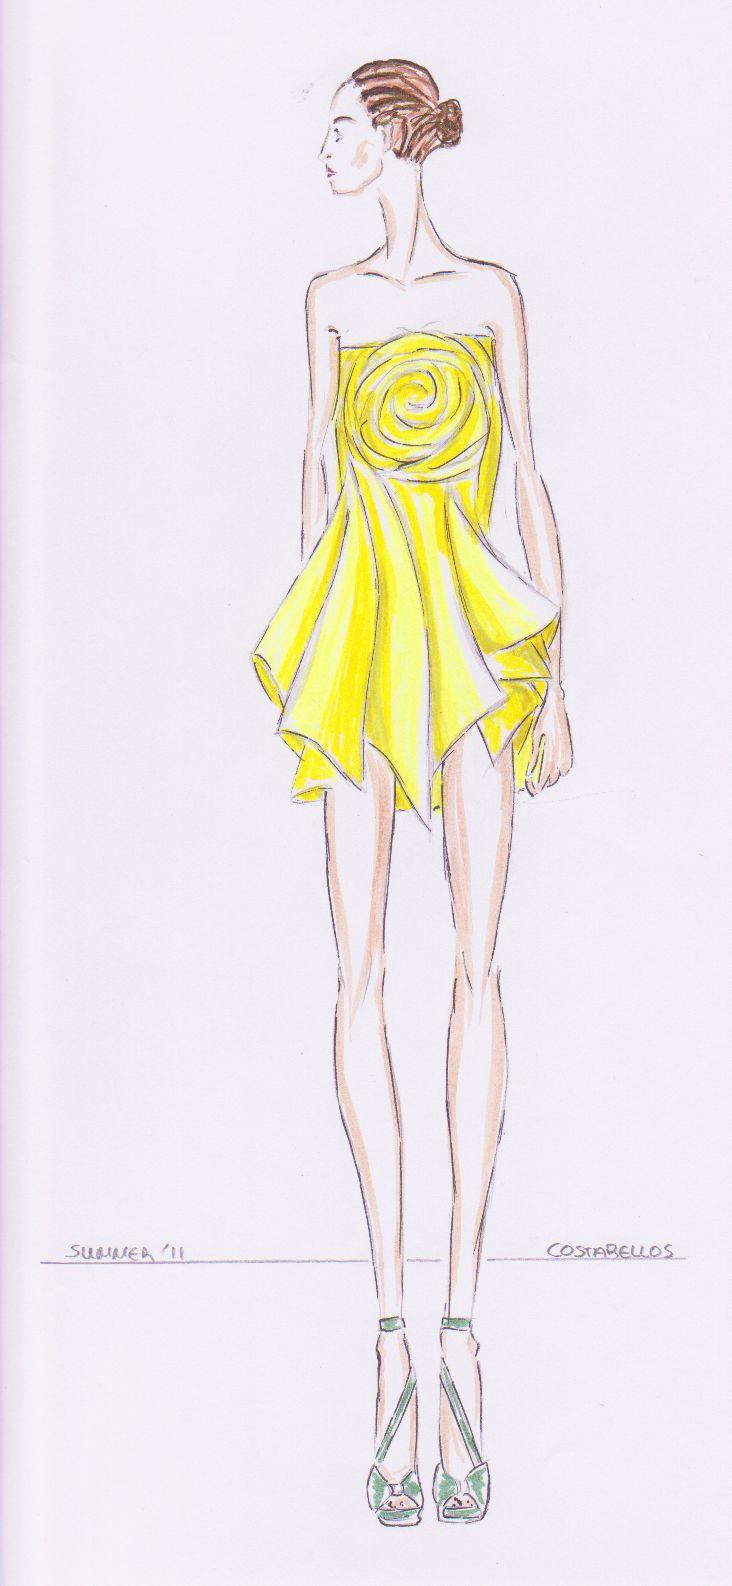 A sketch by Christos Costarellos himself for Gynaika magazine from back in the summer of 2011! #christoscostarellos #costarellos #fashion #couture #hautecouture #moda #mode #magazine #style #summer #editorial #luxury #luxuryfashion #shopping #la #losangeles #lafashion #art #mirror #designer #brand #fashionhouse #fbloggers #fashionbloggers #fashionphotography #madeingreece #retro #vintage #sequins #fashionweek #blastfromthepast #sketch #fashionsketch #designersketch #fashionillustration